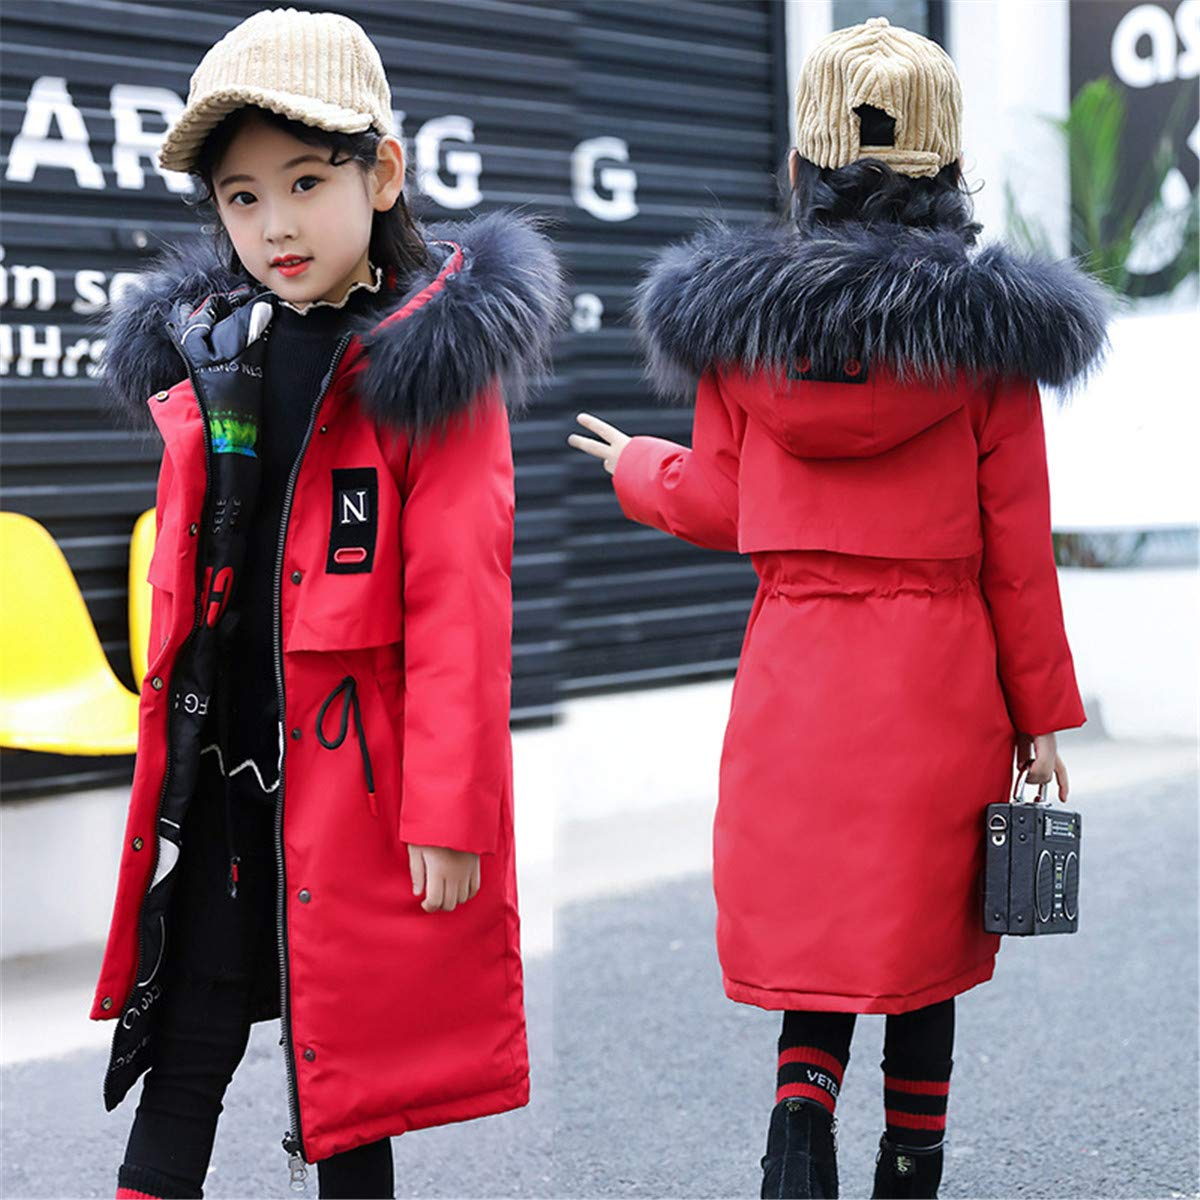 JELEUON Big Girls Zipper Hooded N Letter Drawstring Fur Trim Winter Warm Long Snowsuit Puffer Down Jacket Coat Outwear